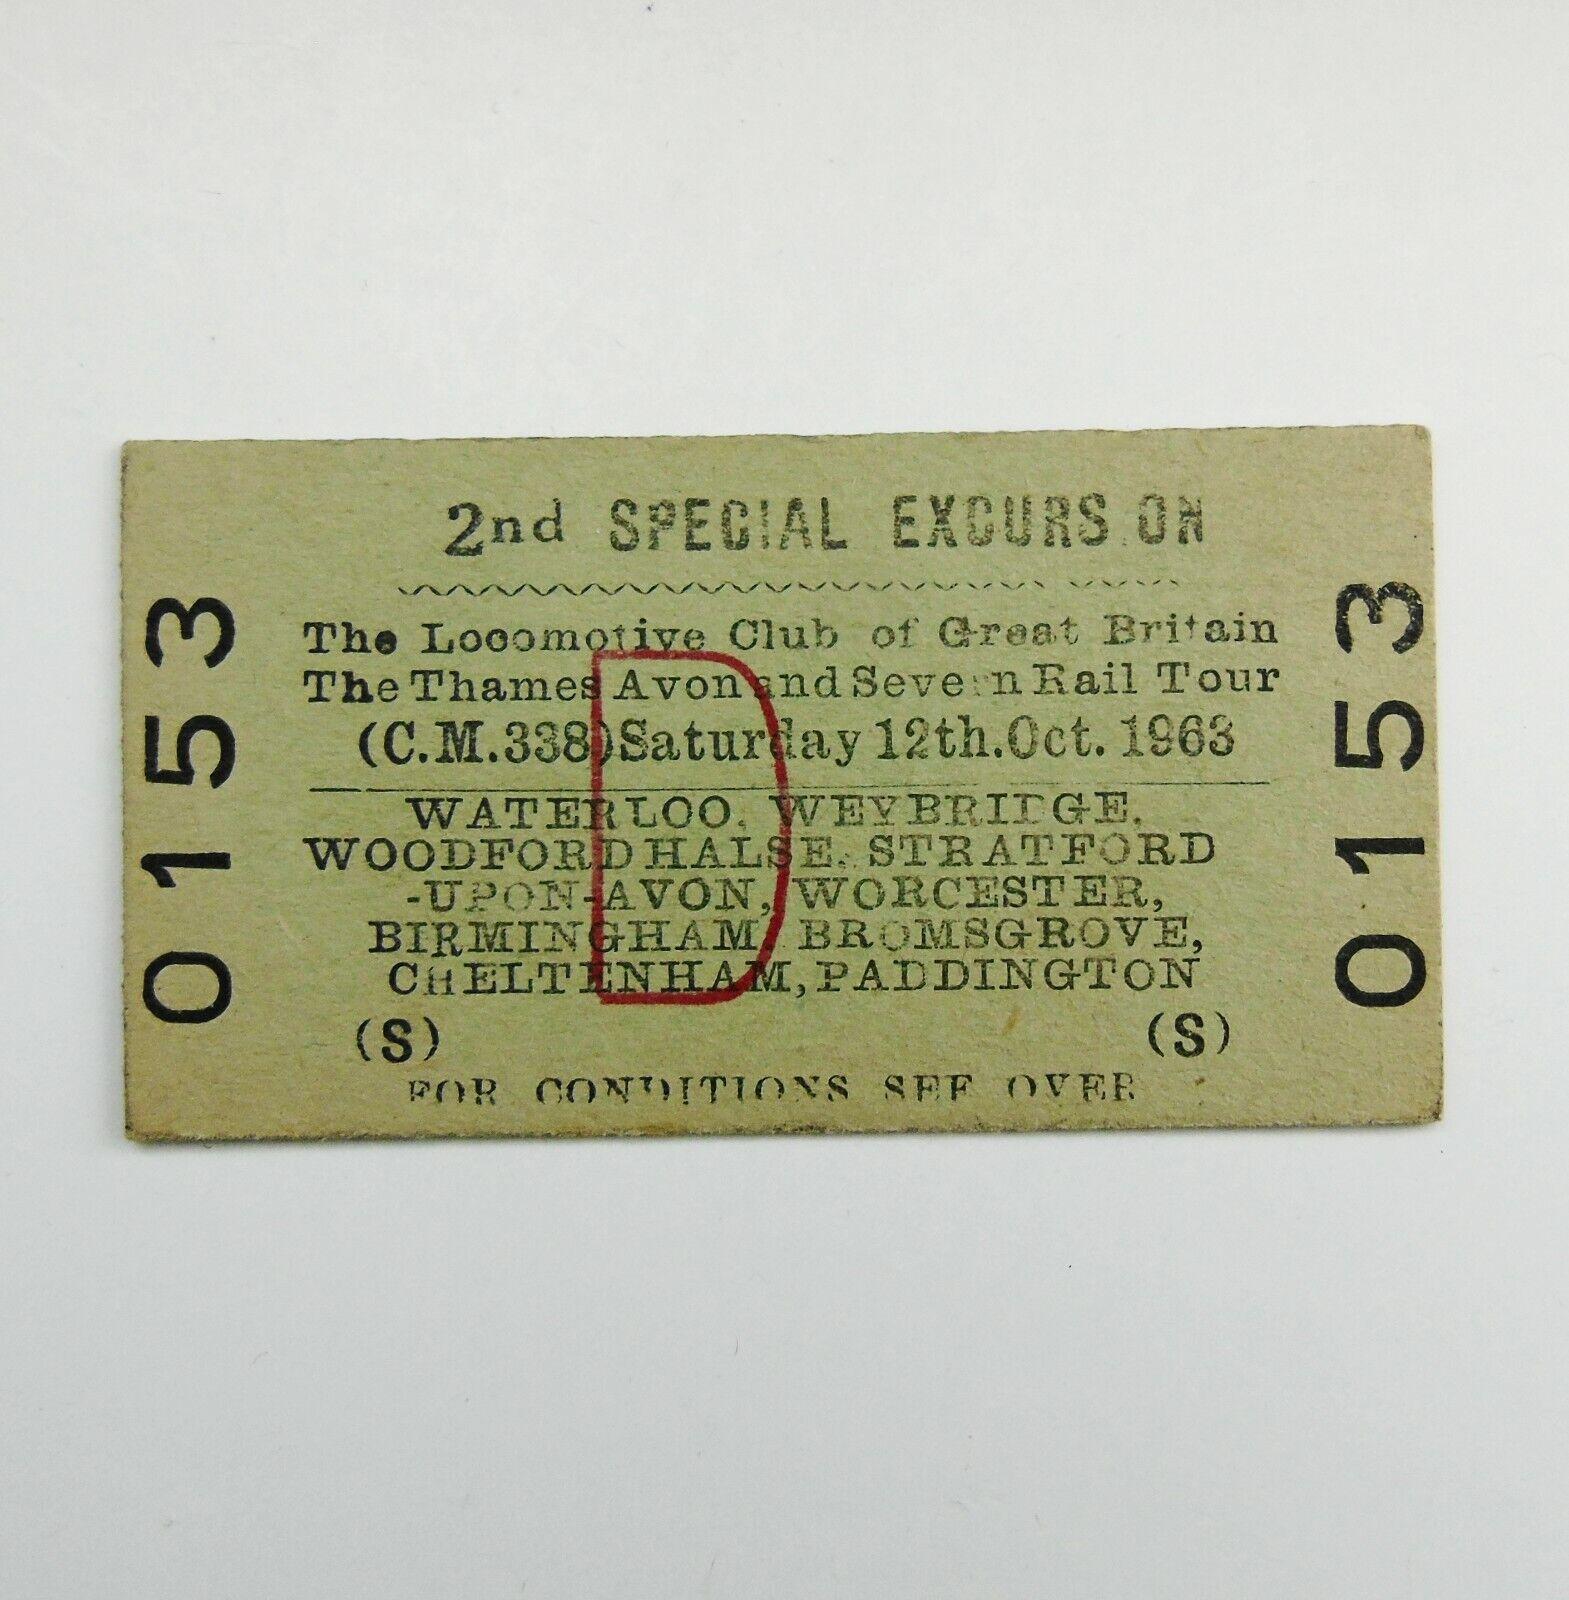 BR The Thames Avon and Severn Rail Tour 1963 Railway Ticket LCGB